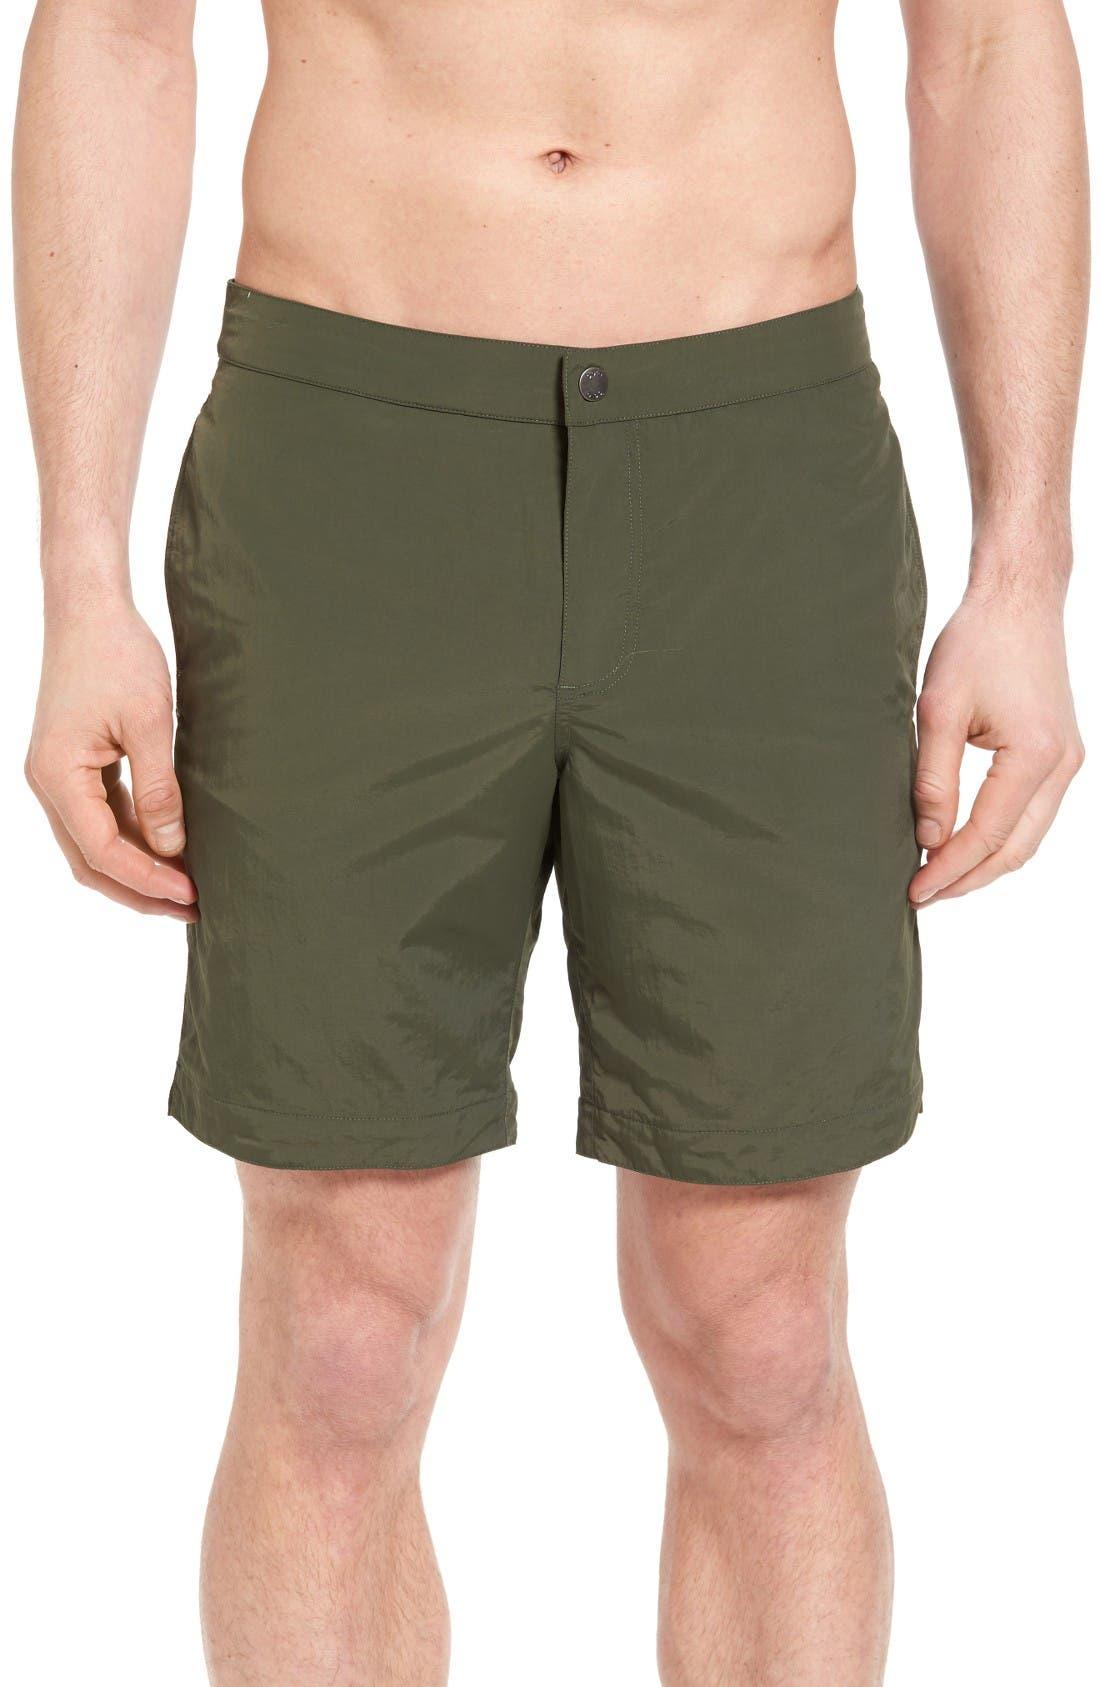 boto 'Aruba - Island' Tailored Fit 8.5 Inch Board Shorts